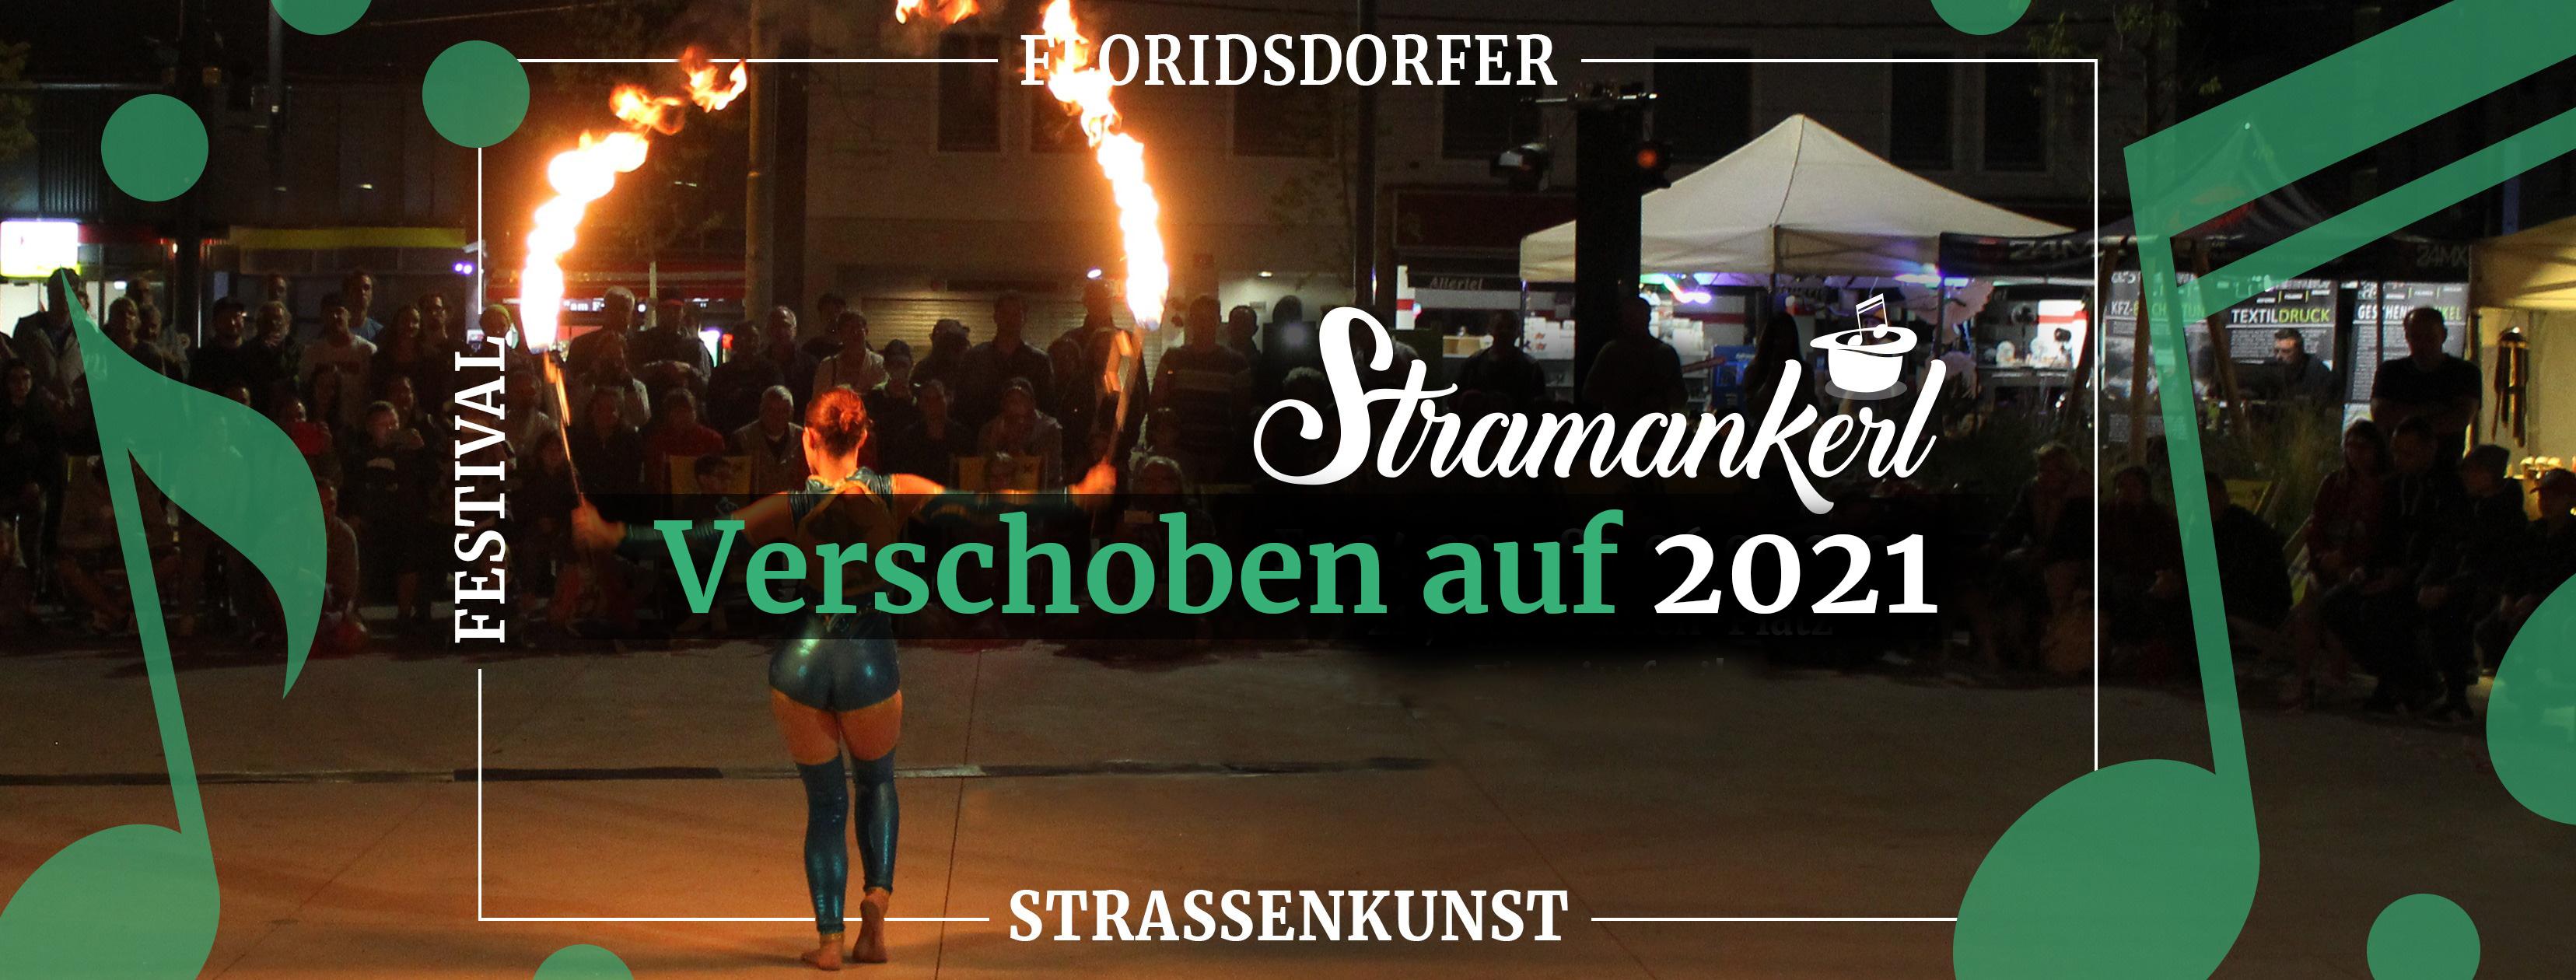 Stramankerl 2020